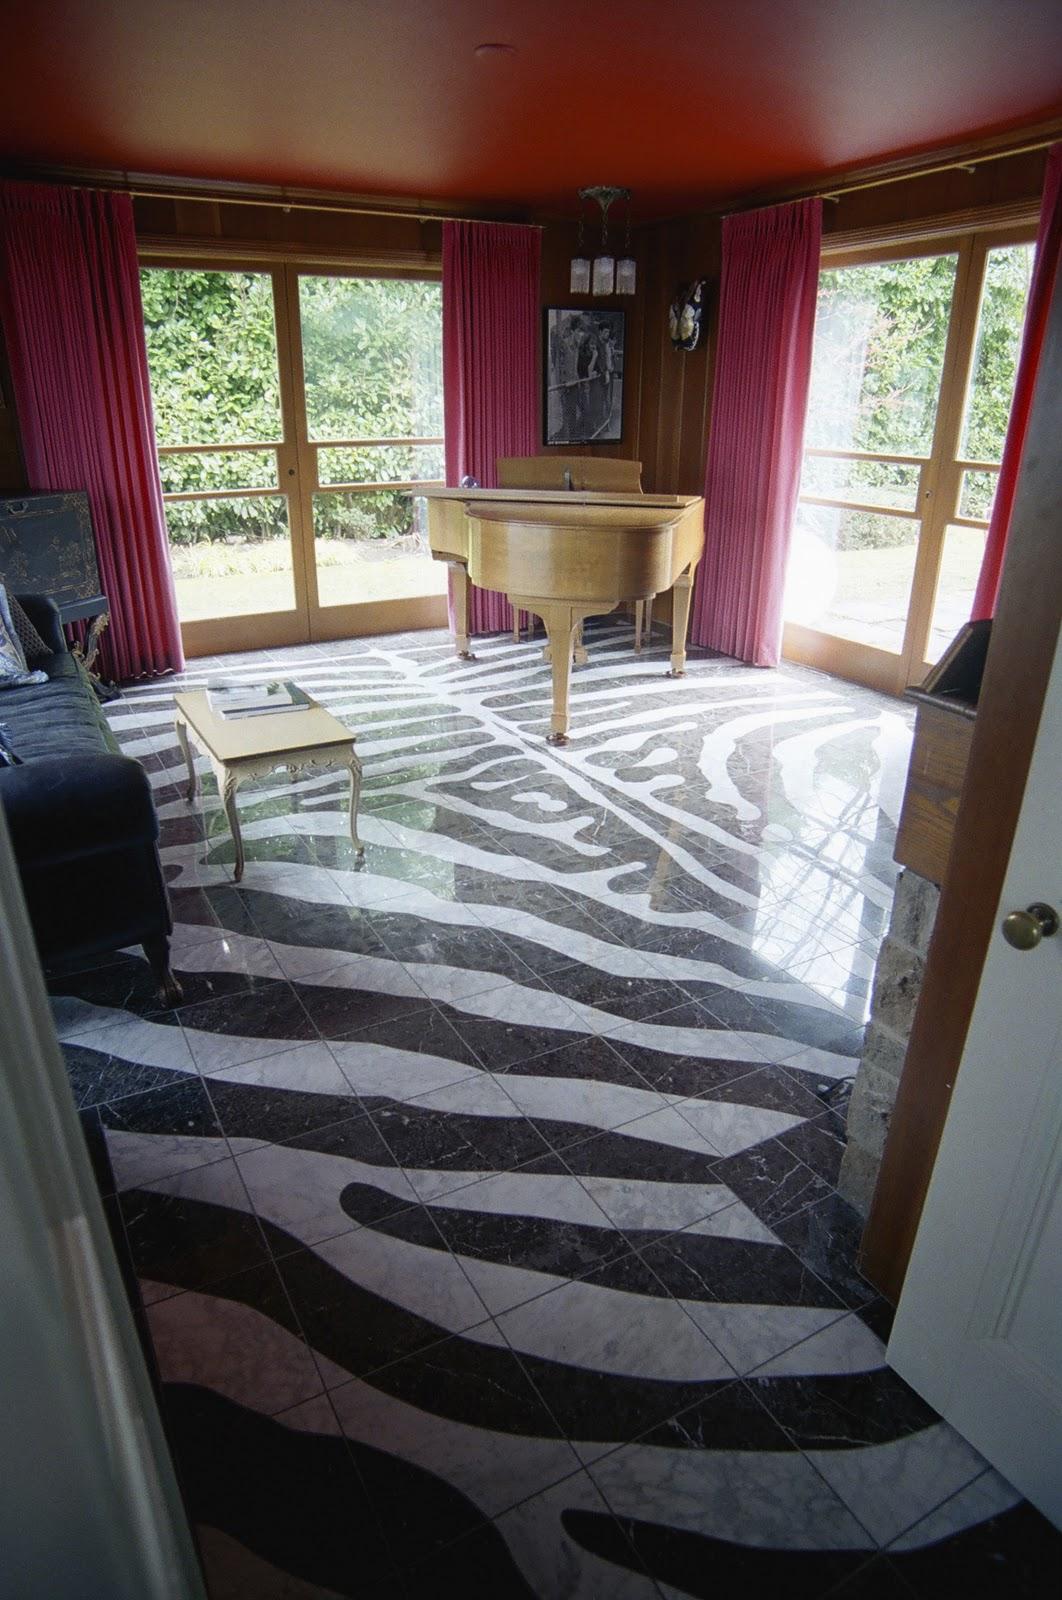 Handyman Doye Zebra Underfoot Cut Work Marble Floor